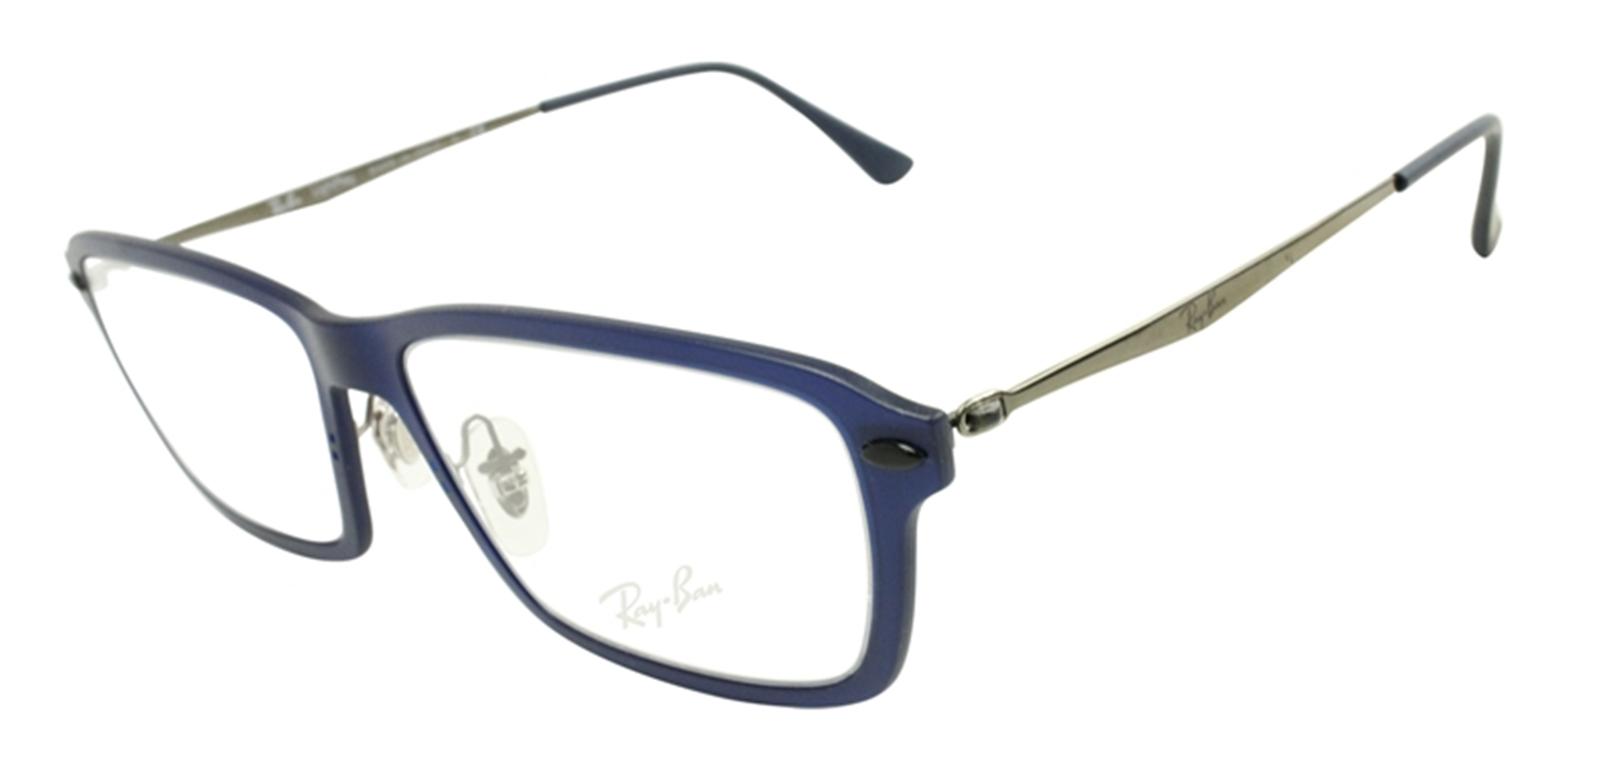 db6e8e025da New Authentic RAY-BAN RB 7038 5451 Blue and 50 similar items